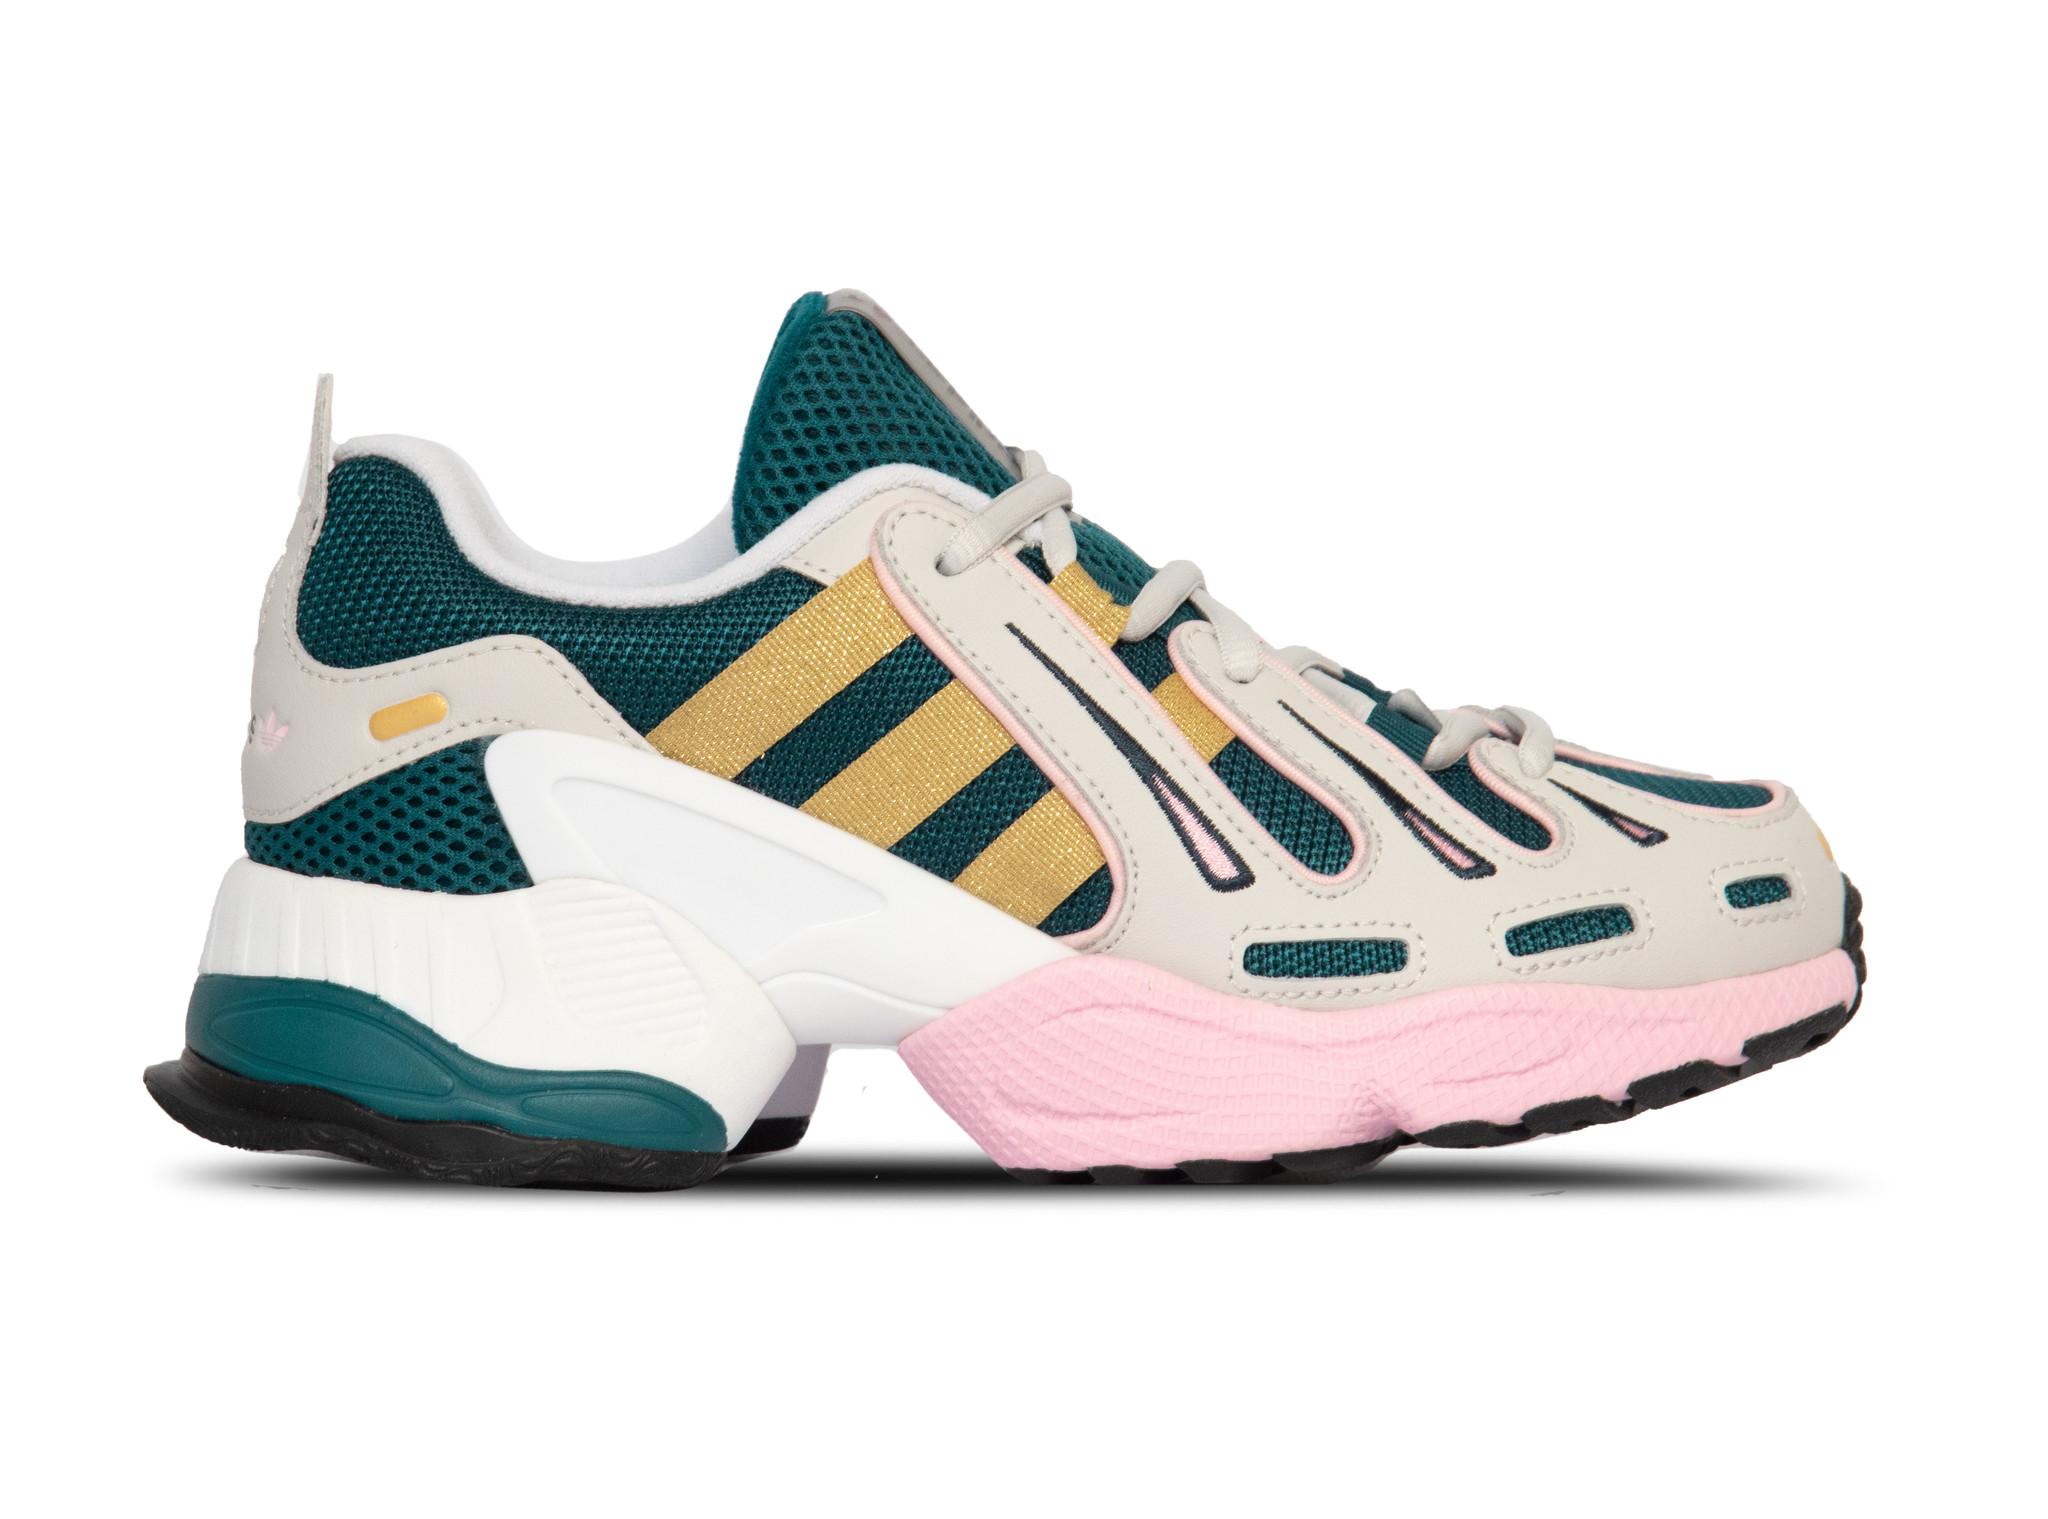 Eqt Gazelle W Ee5149 Bruut Online Shop & Sneakerstore